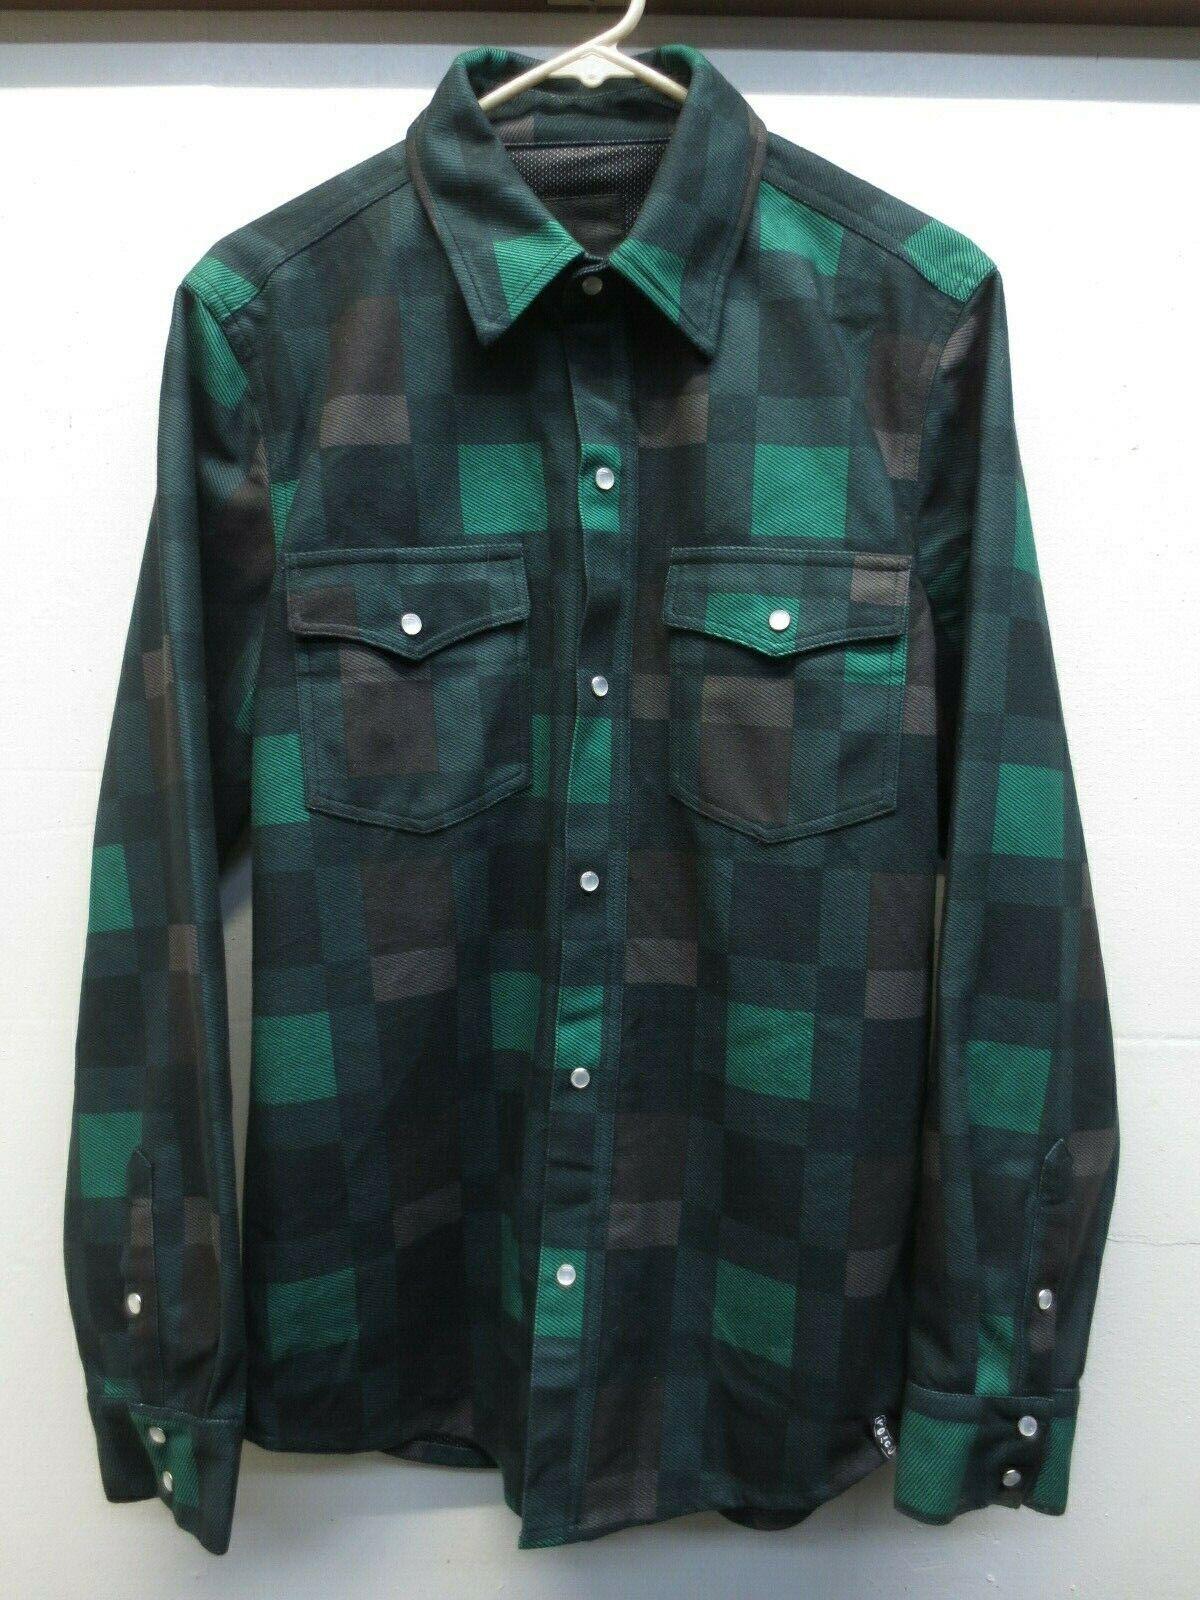 EUC Volcom AKA Bonded Flannel Field Green Plaid Pearl Snap Shirt Jacket Sz Small